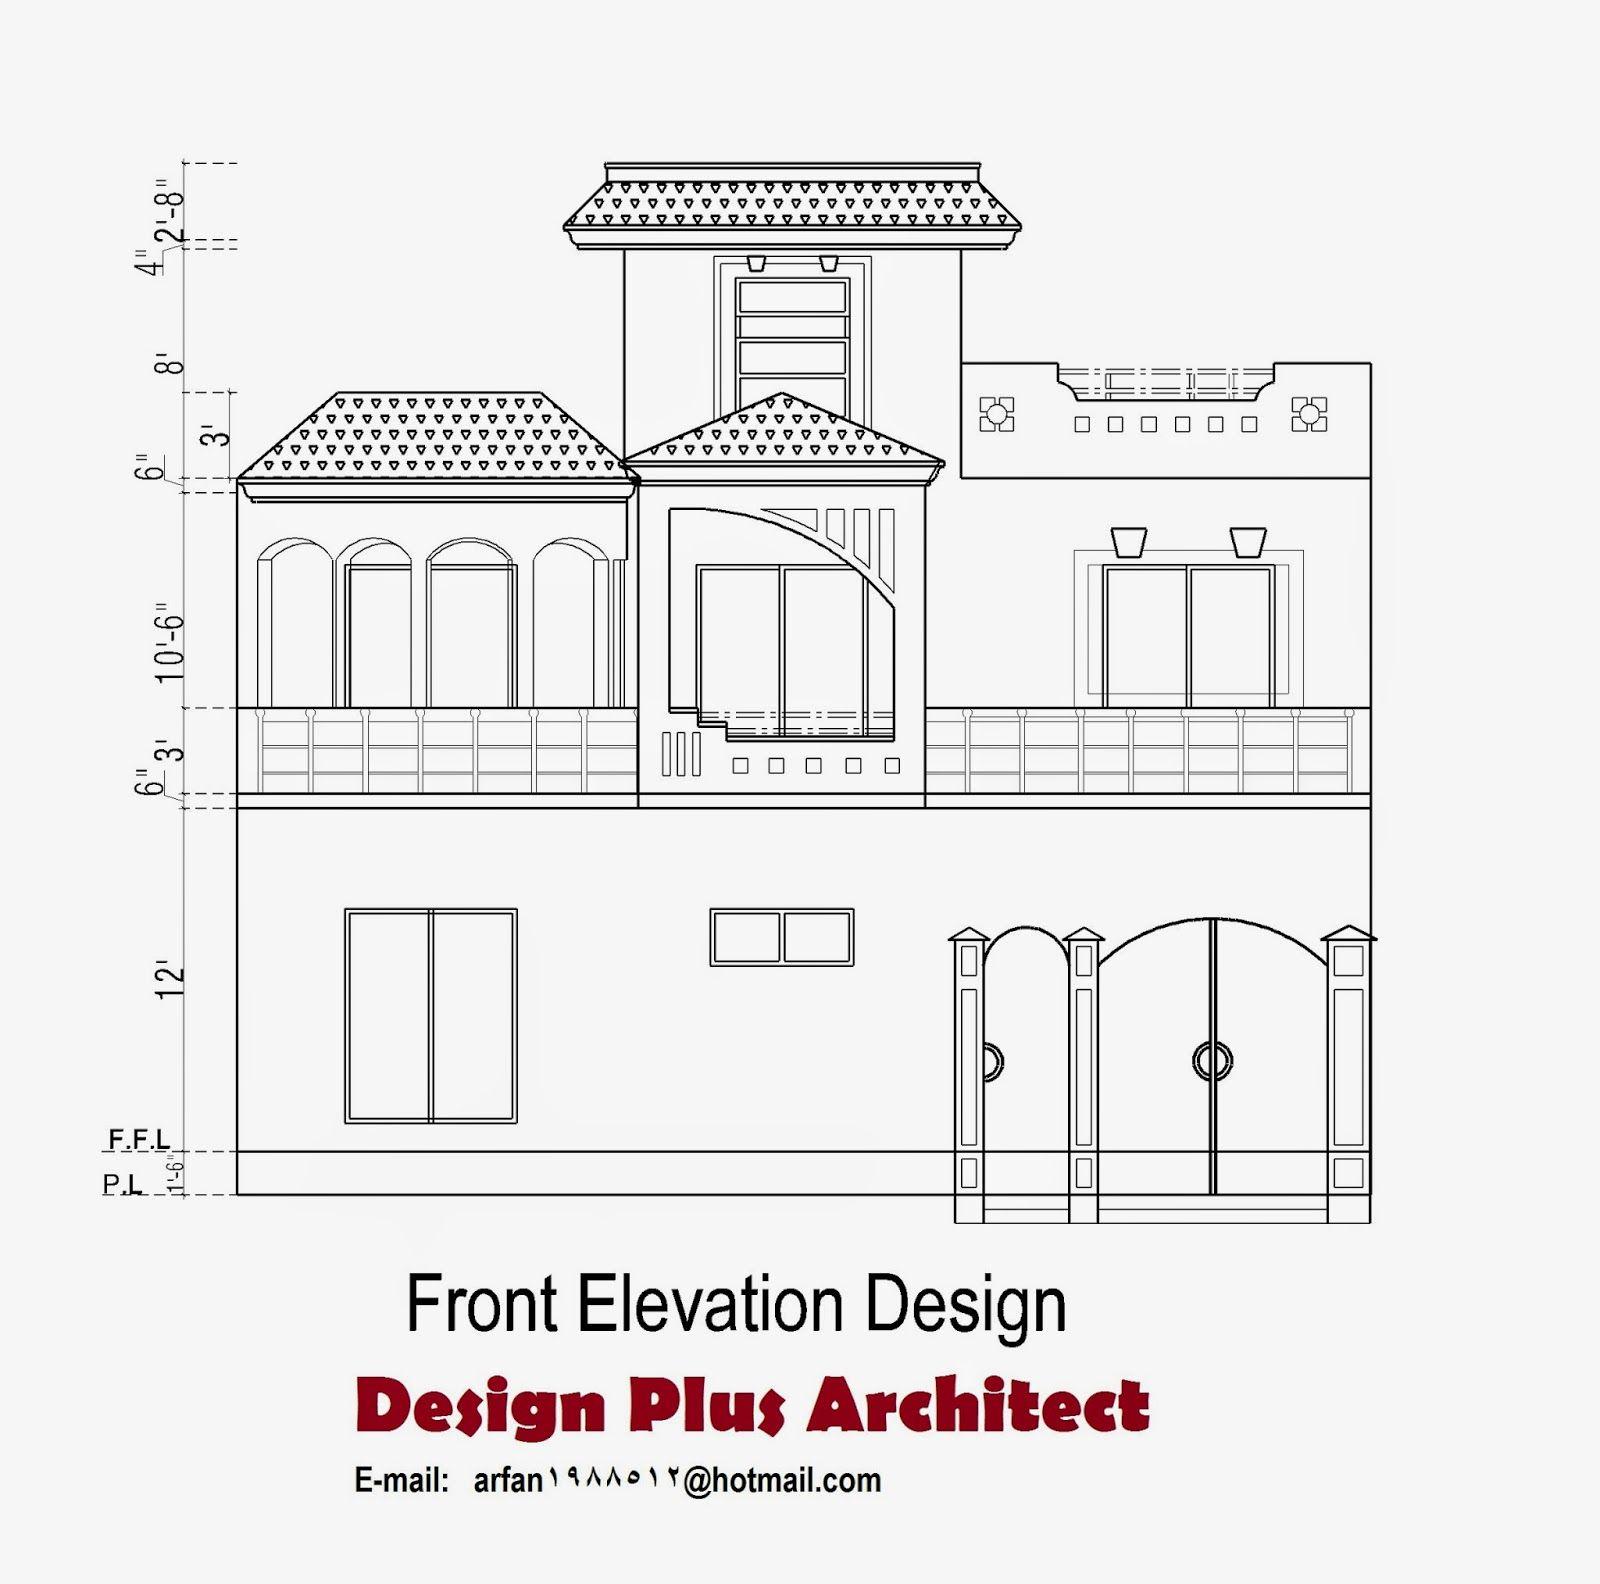 Home plans in pakistan  plan house also muhammad arfan alinazim on pinterest rh